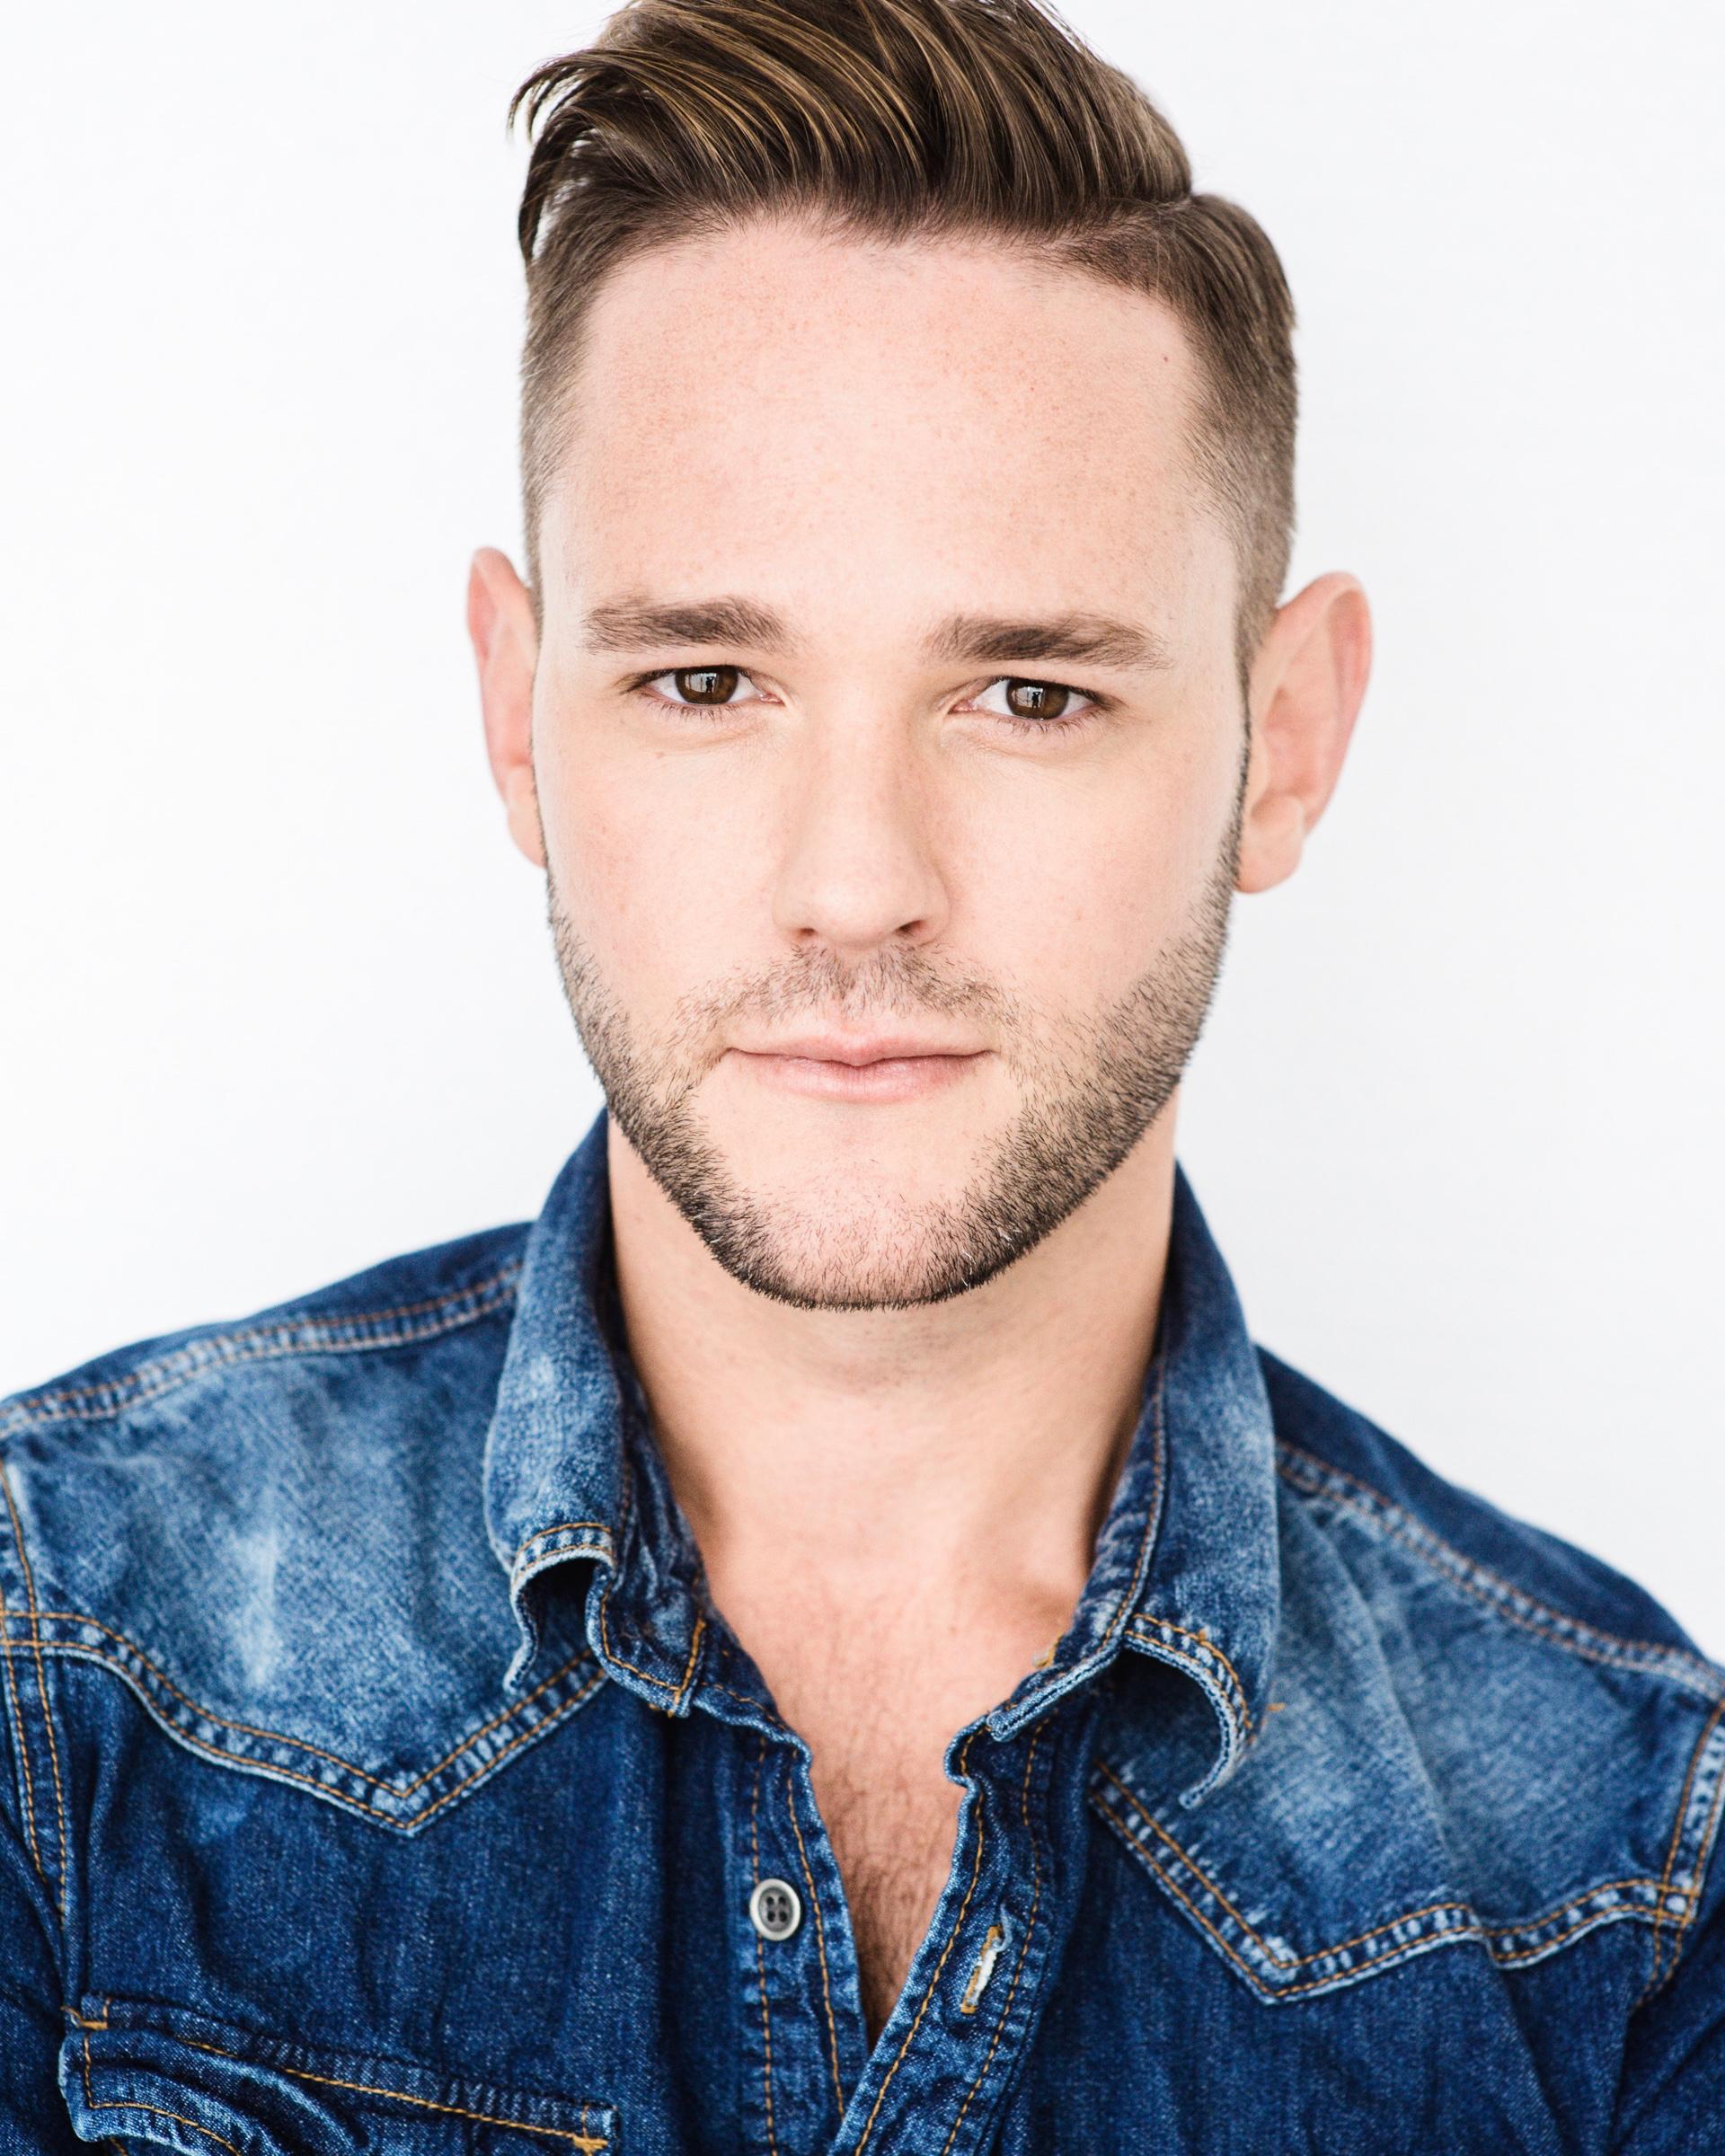 Ryan Sheppard